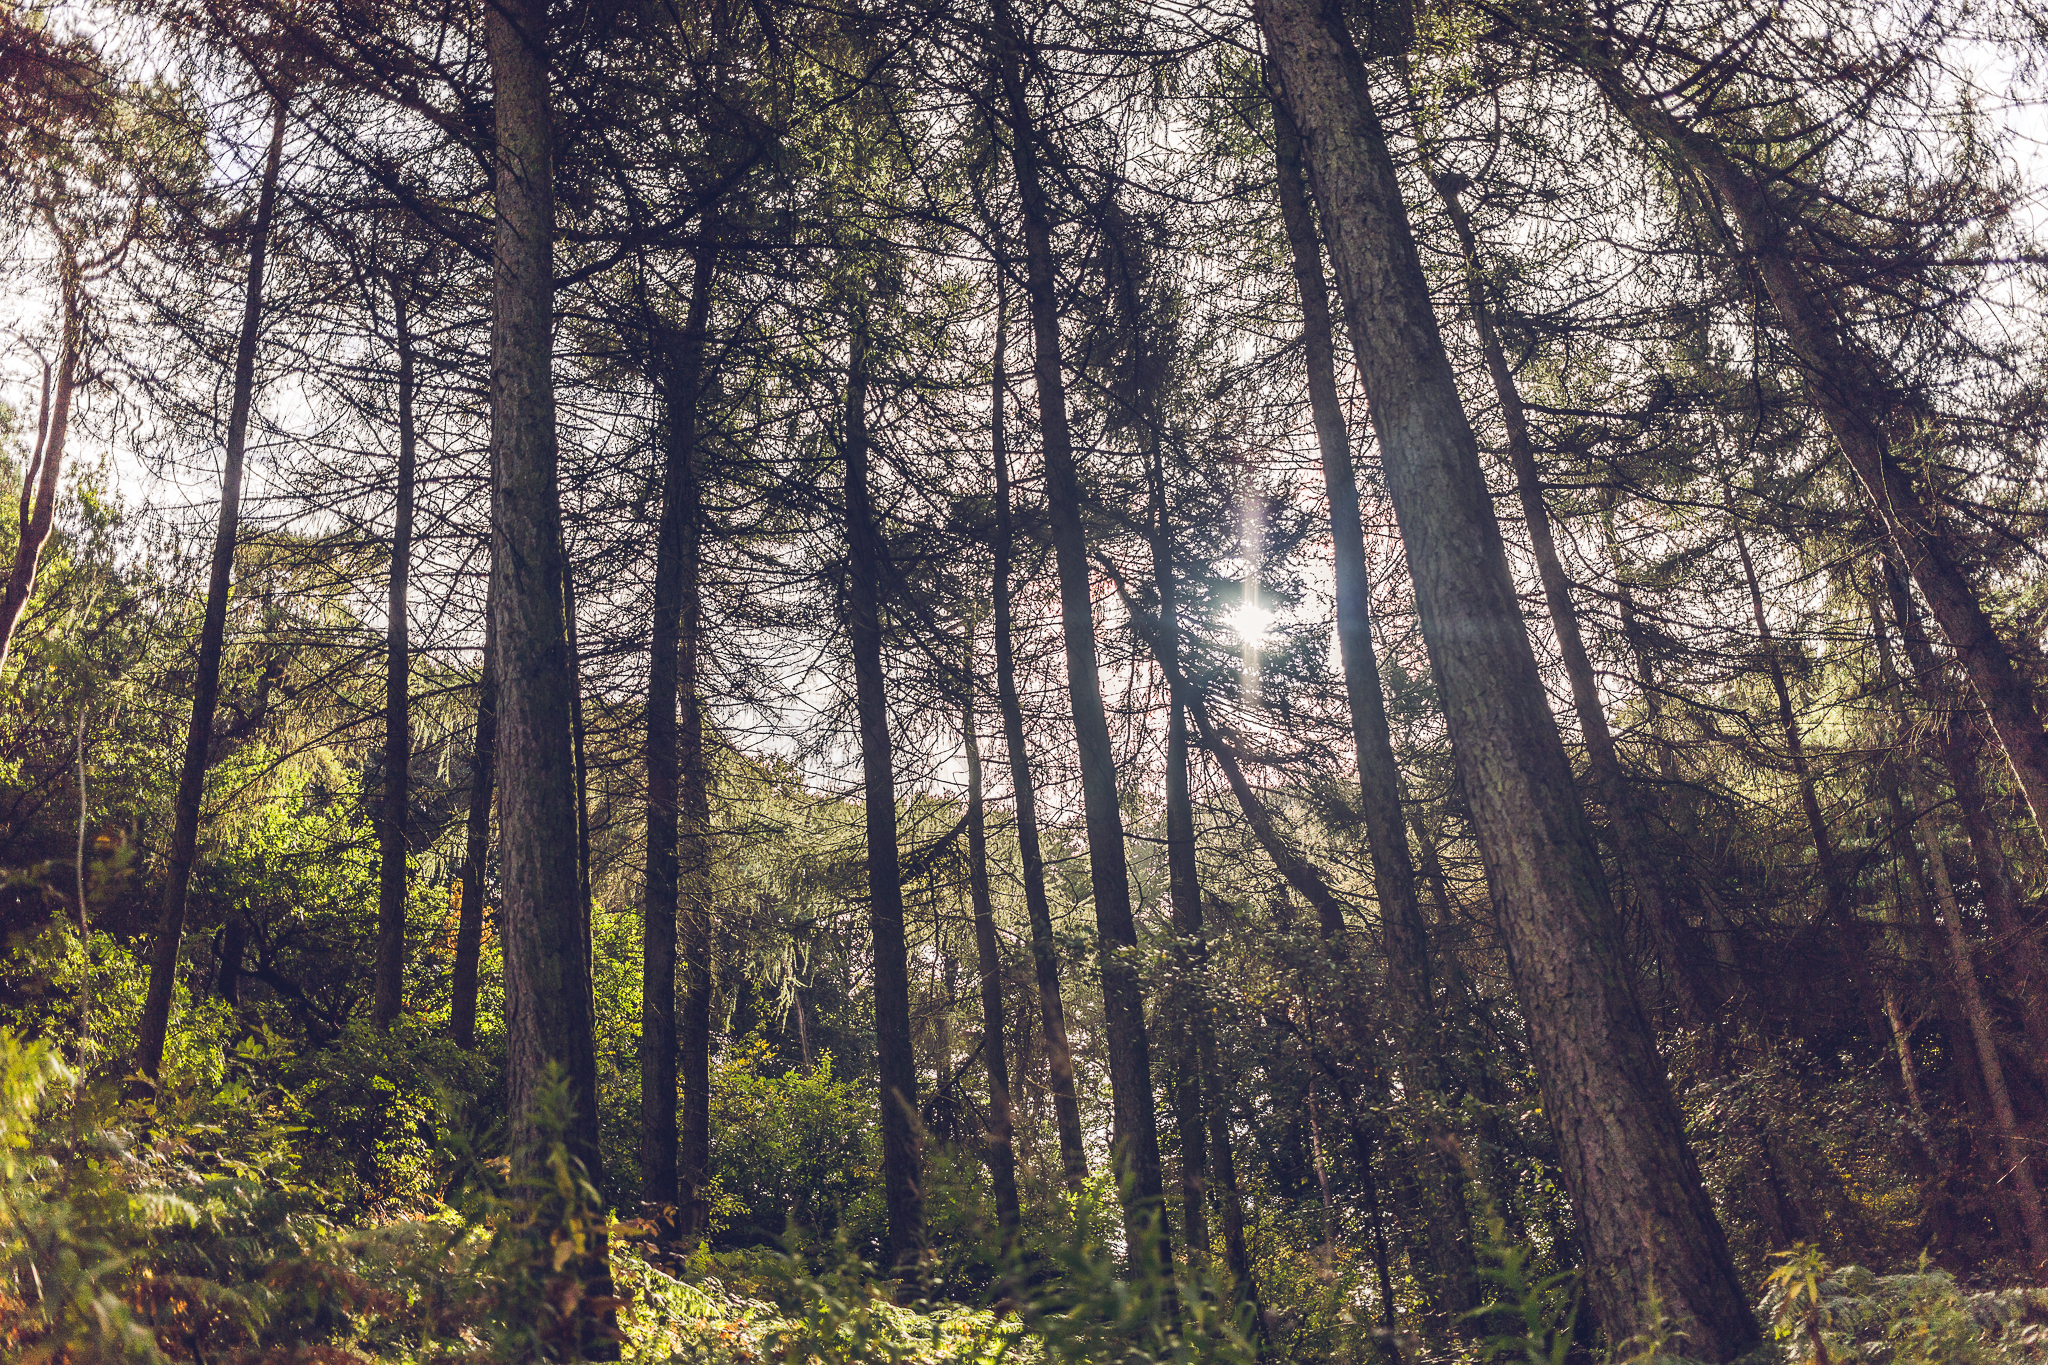 001-processed-trees